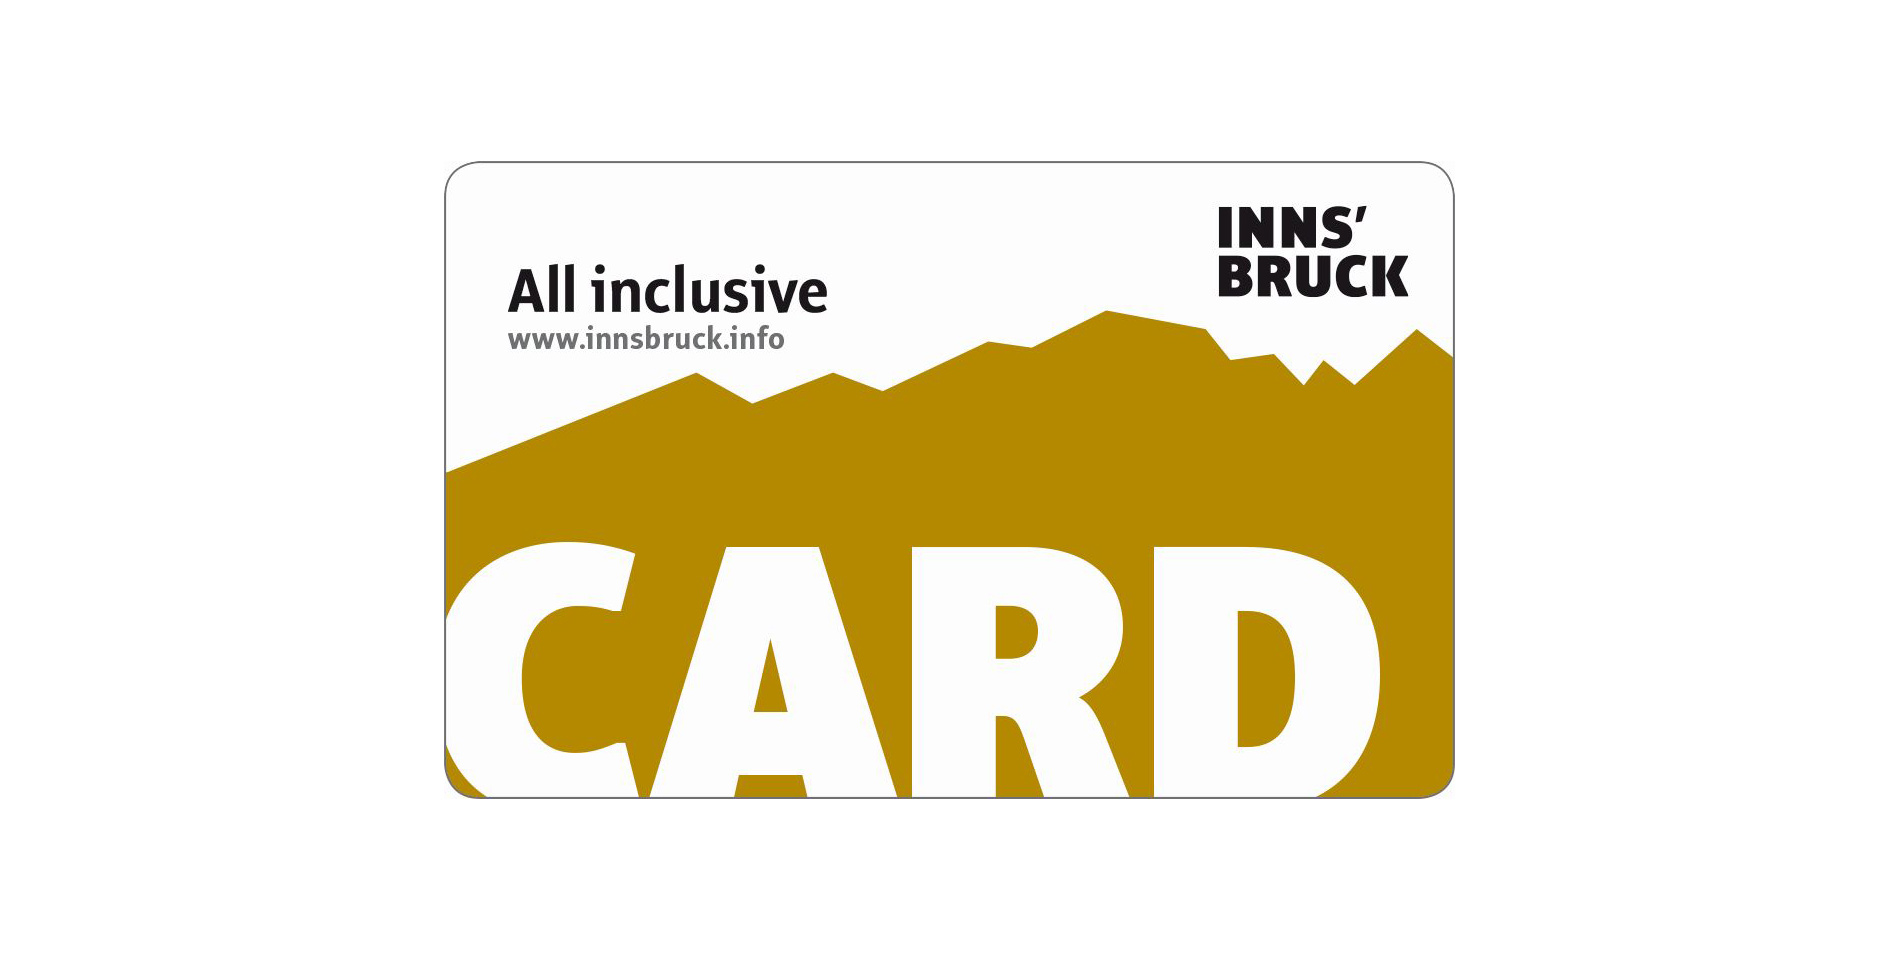 Innsbruck Card - Innsbruck - Arrivalguides.com